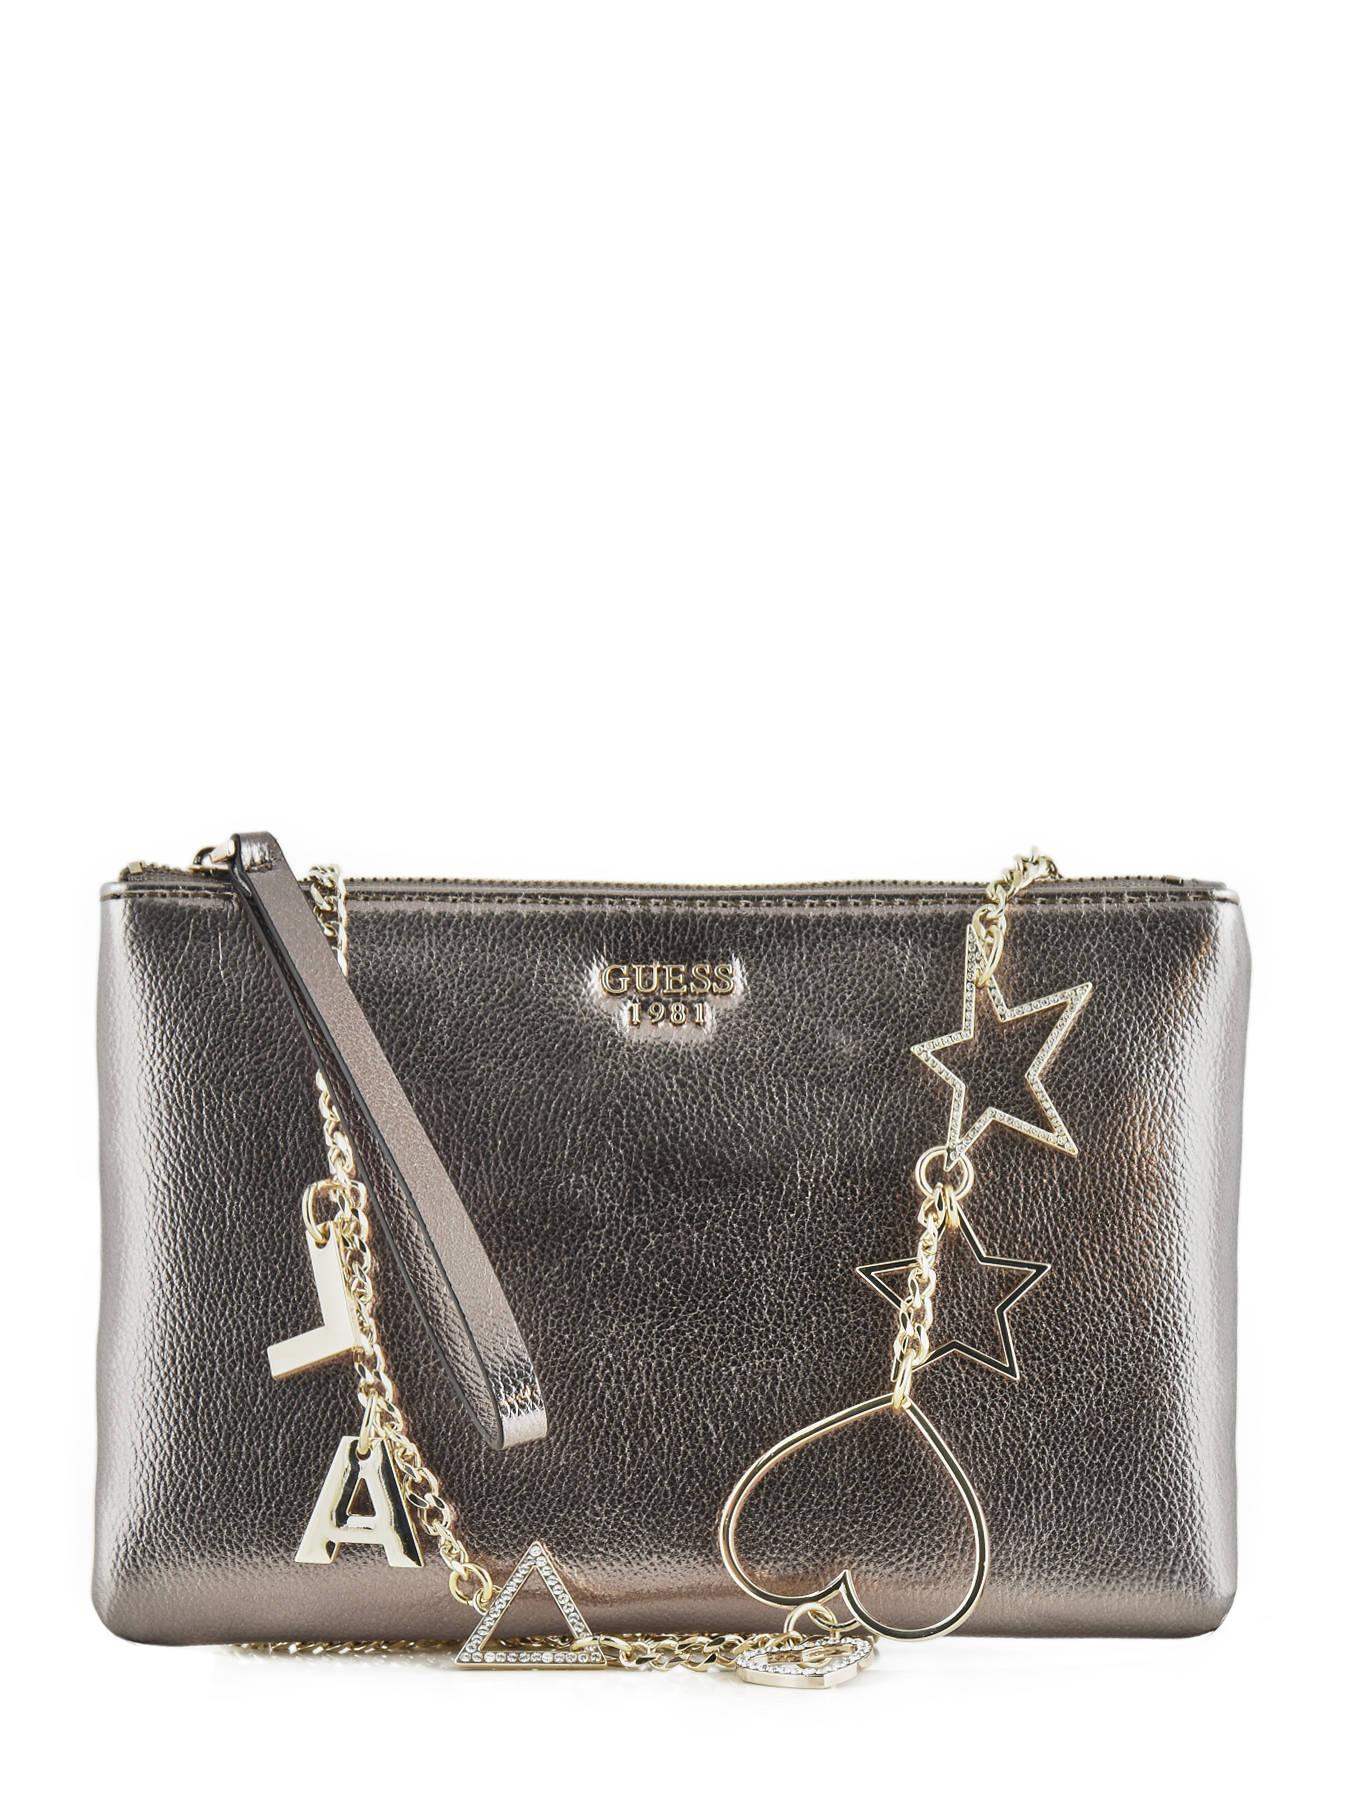 a0e77a54e168 Guess Clutch bag HWVG.7185690 - best prices